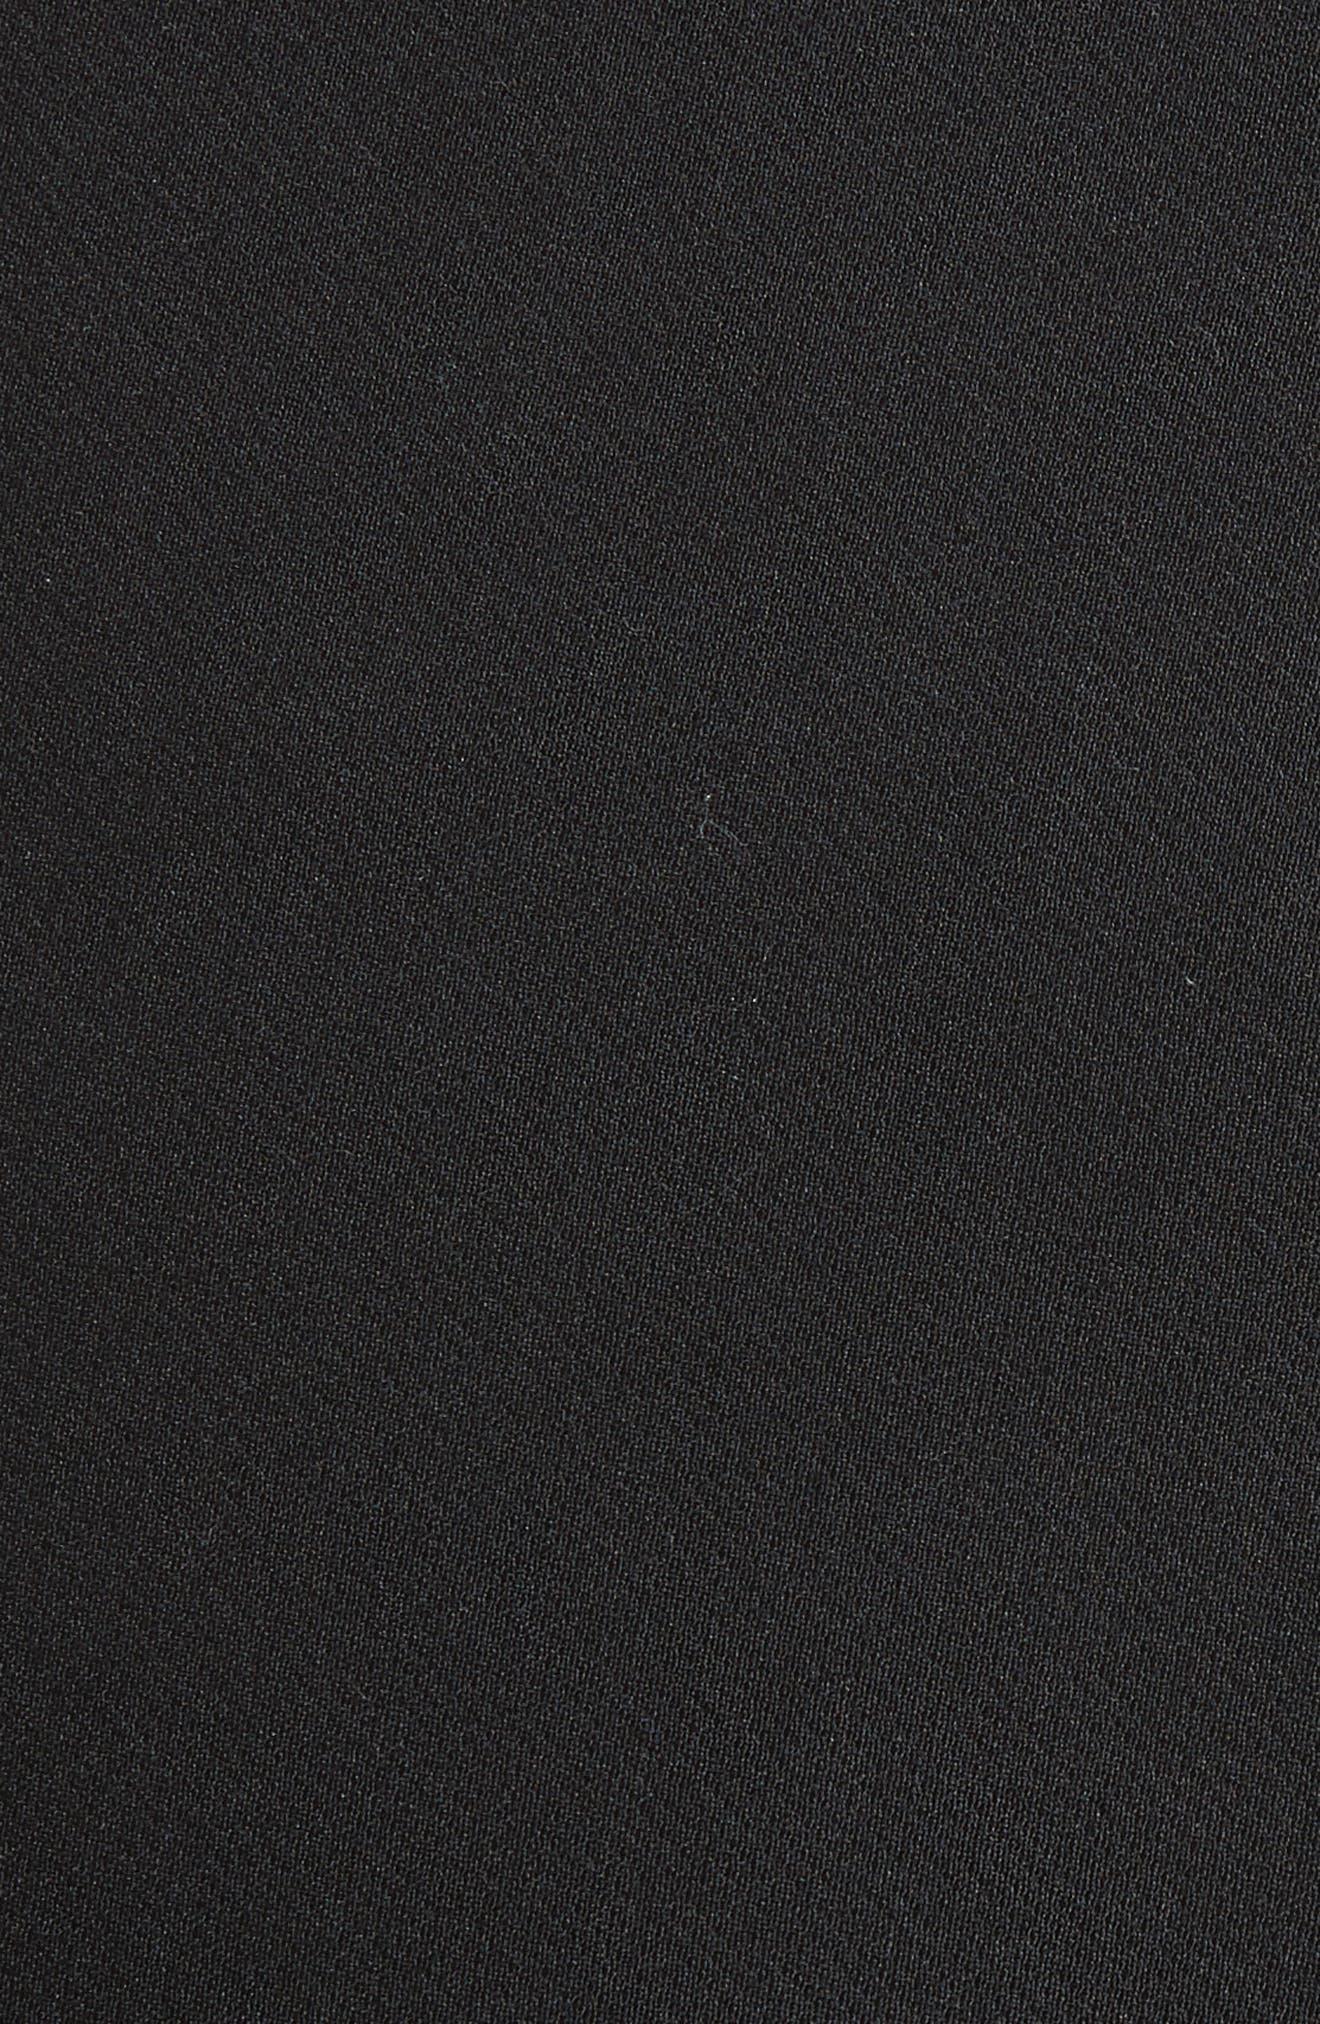 Faux Leather Stretch Leggings,                             Alternate thumbnail 3, color,                             Black